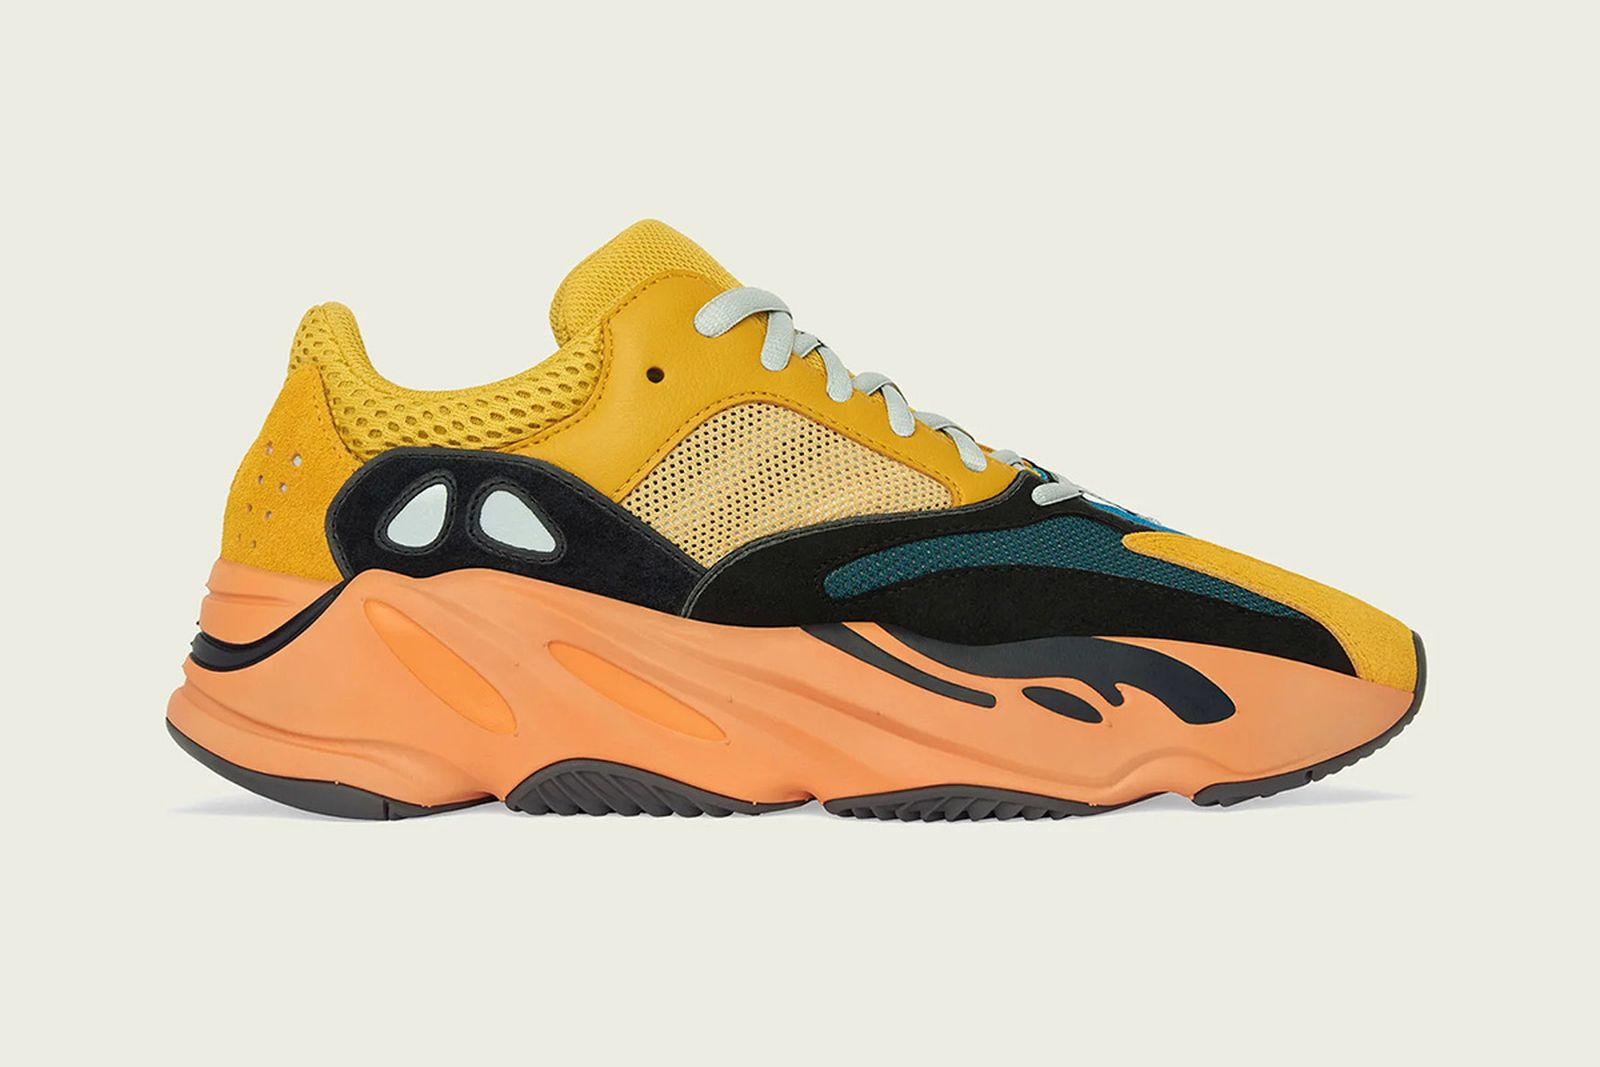 adidas-yeezy-boost-700-sun-release-date-price-04